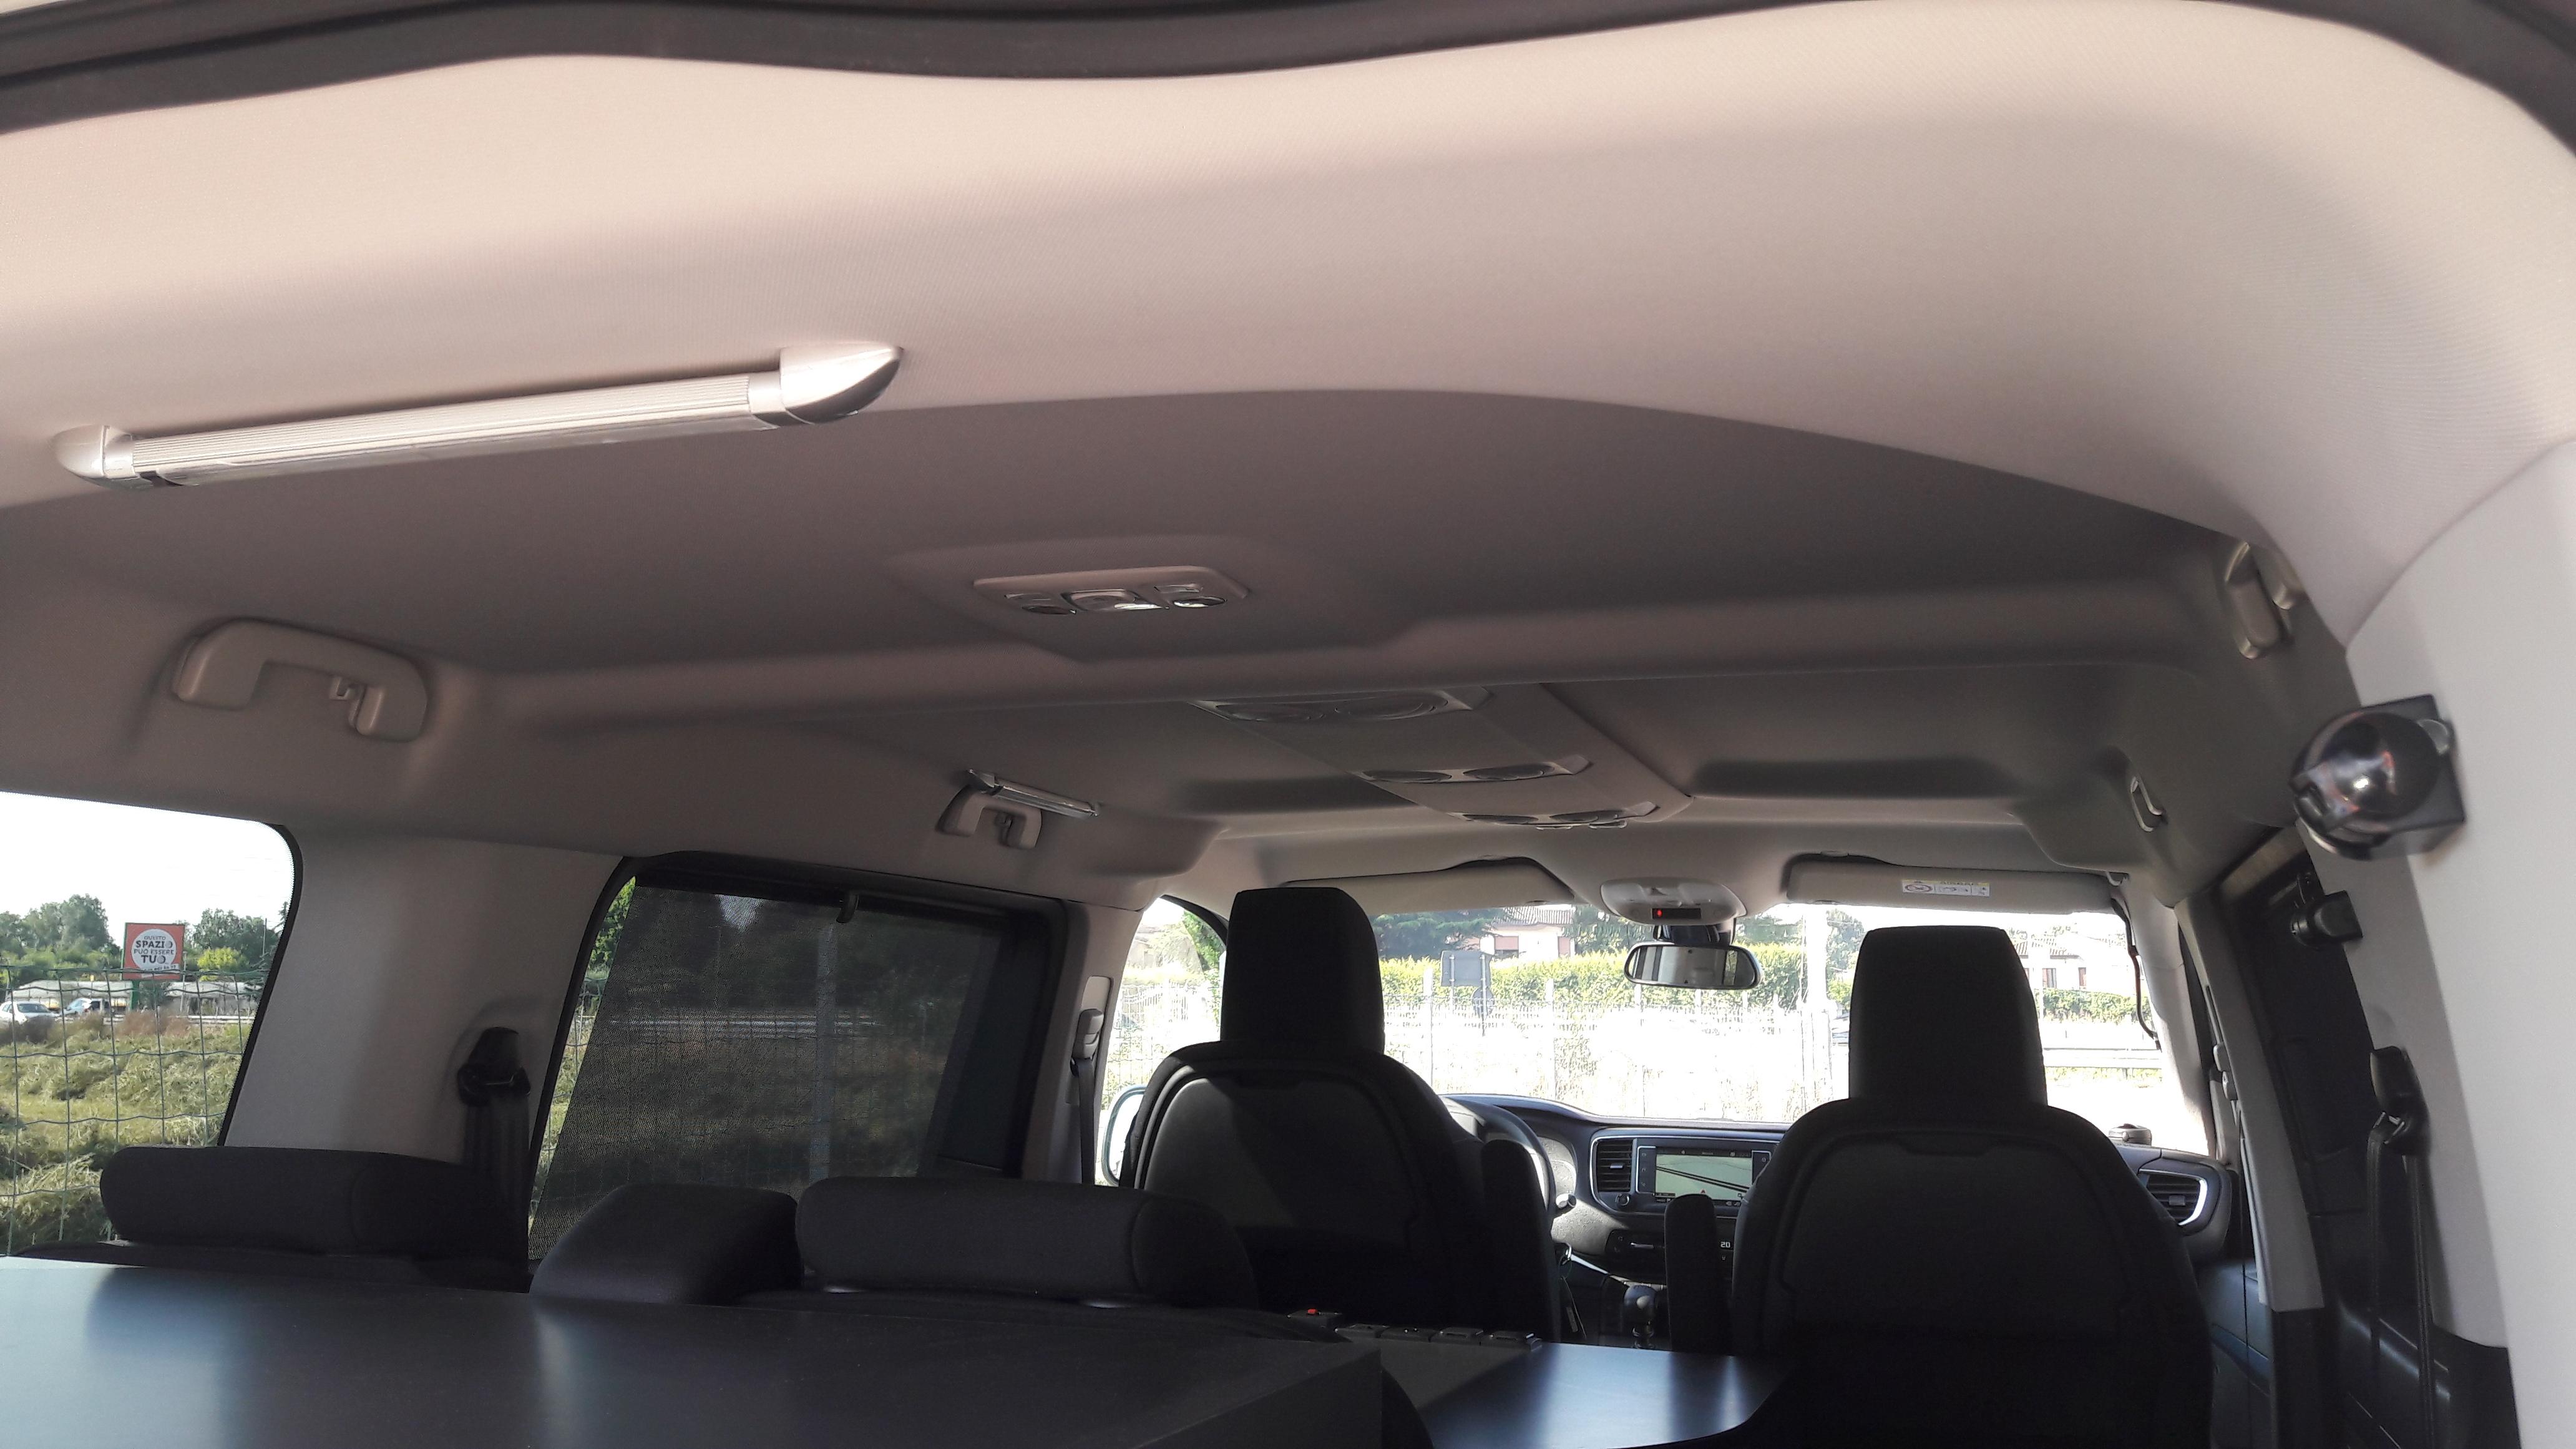 Sedia Ufficio Jeep : Jeep renegade bu portatutto full cargo rack cinghia on